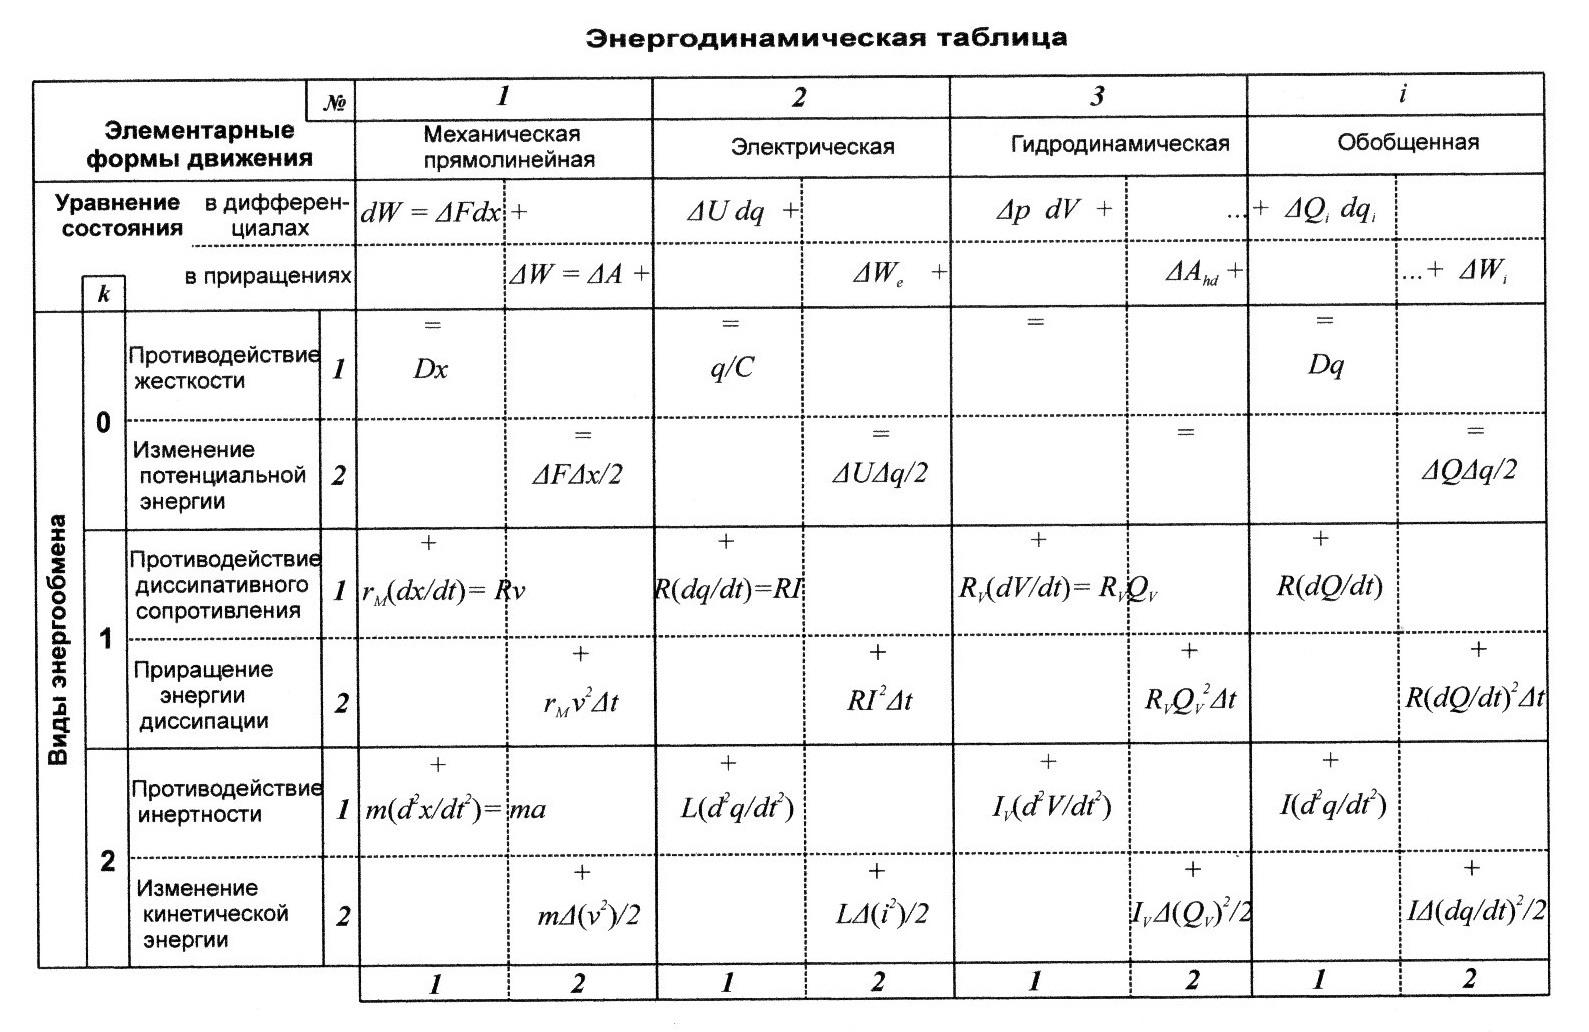 Физика 9 класс формулы таблица